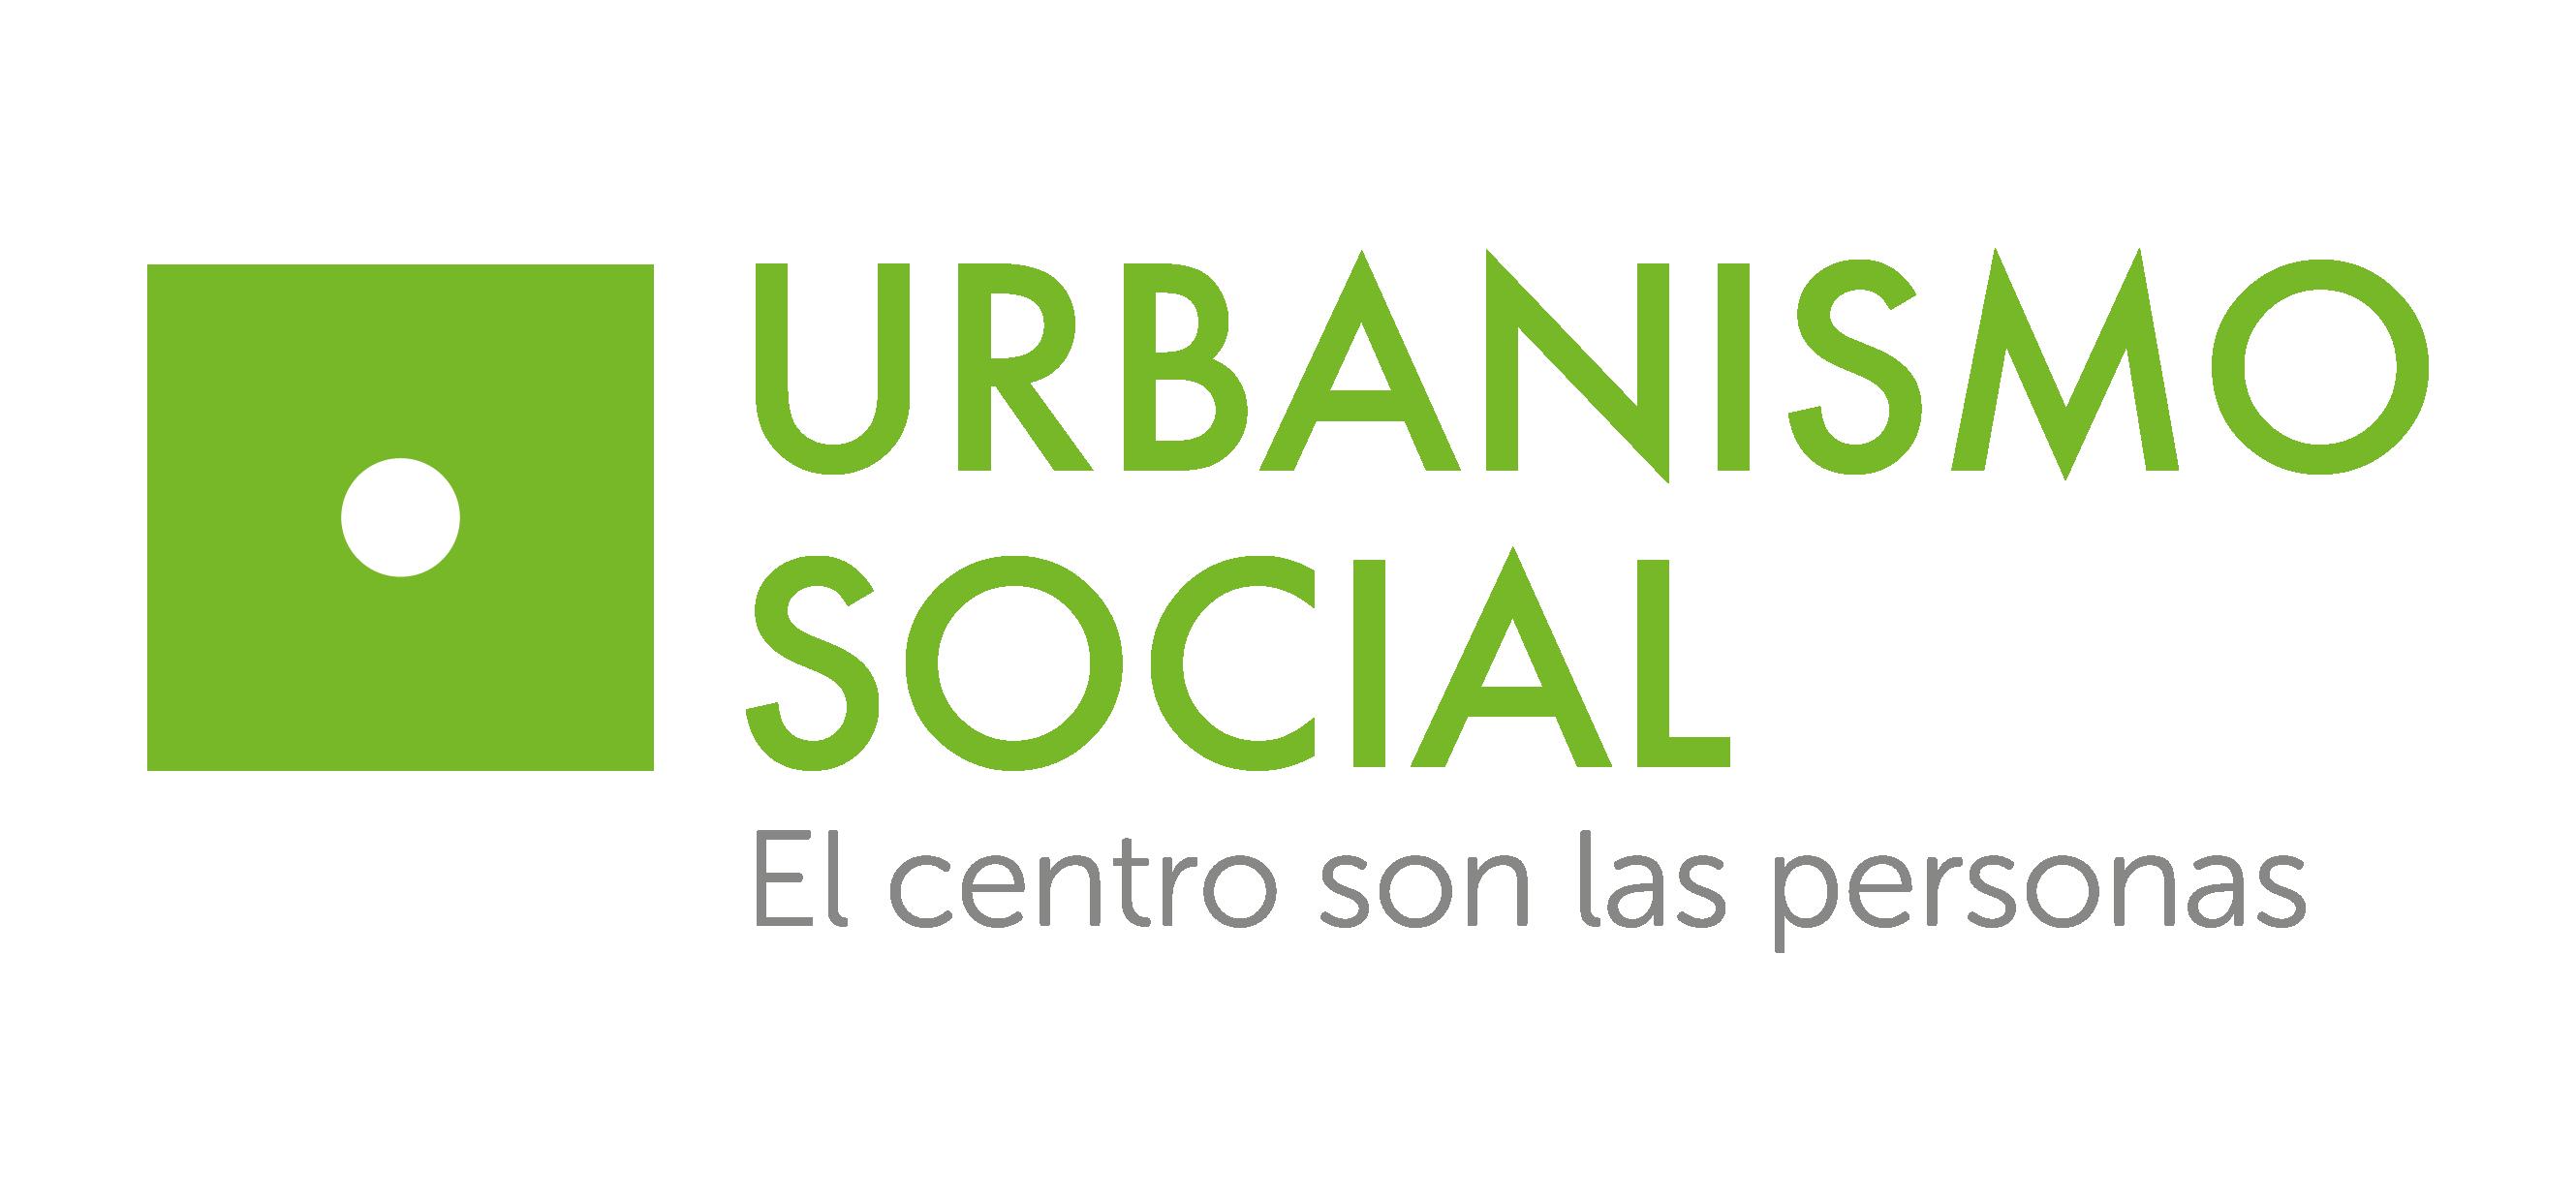 https://urbanismosocial.cl/